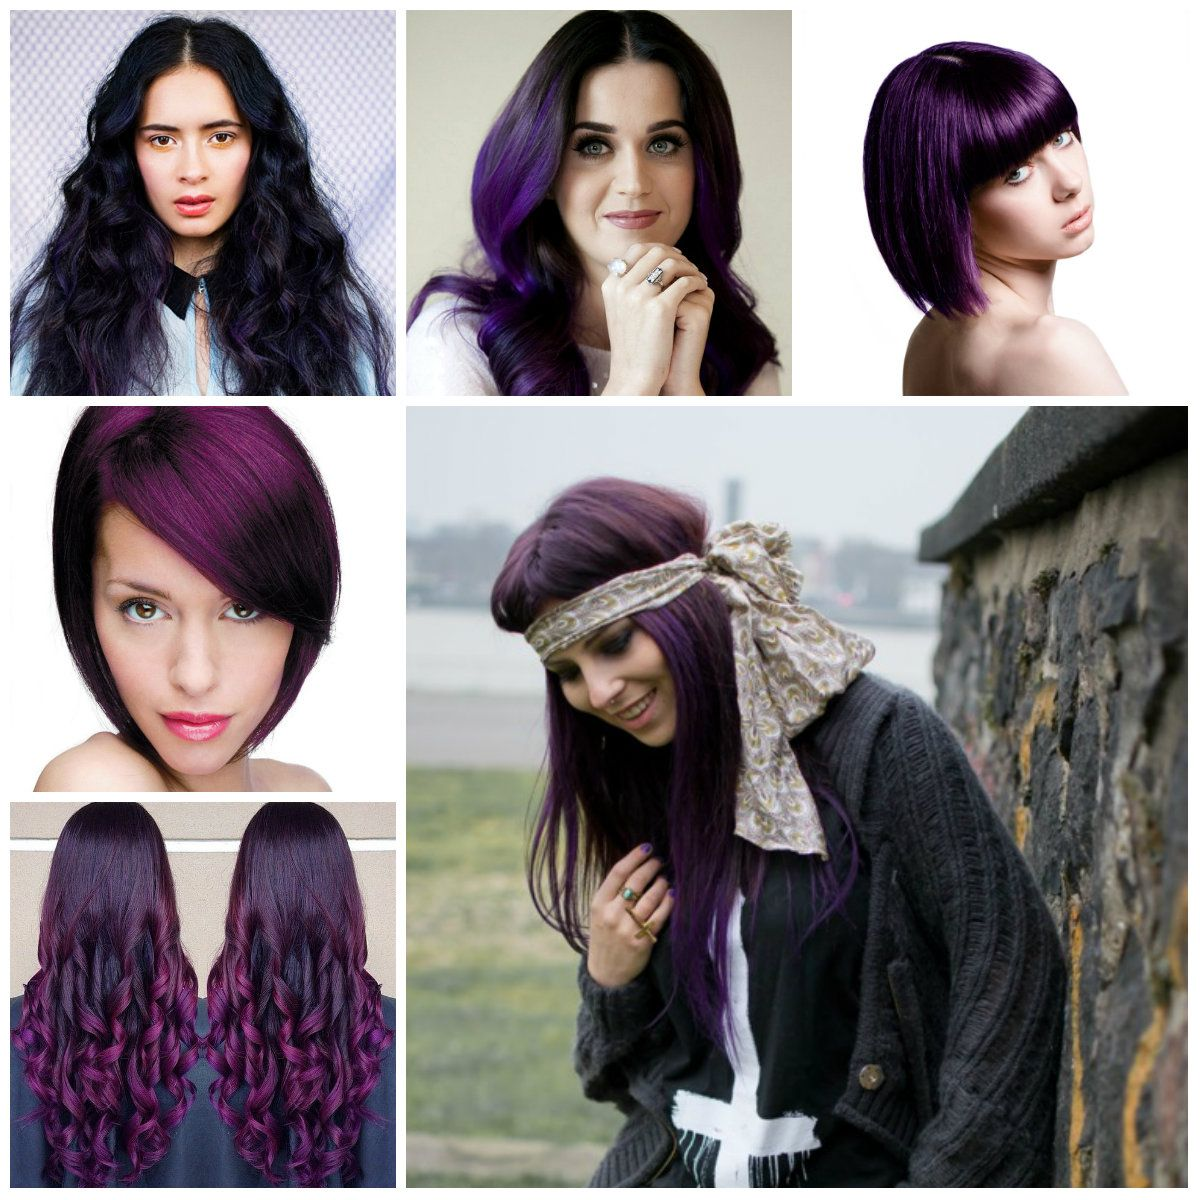 Hairstyles 2016 dark hair - Dark Puple Hair Color 2016